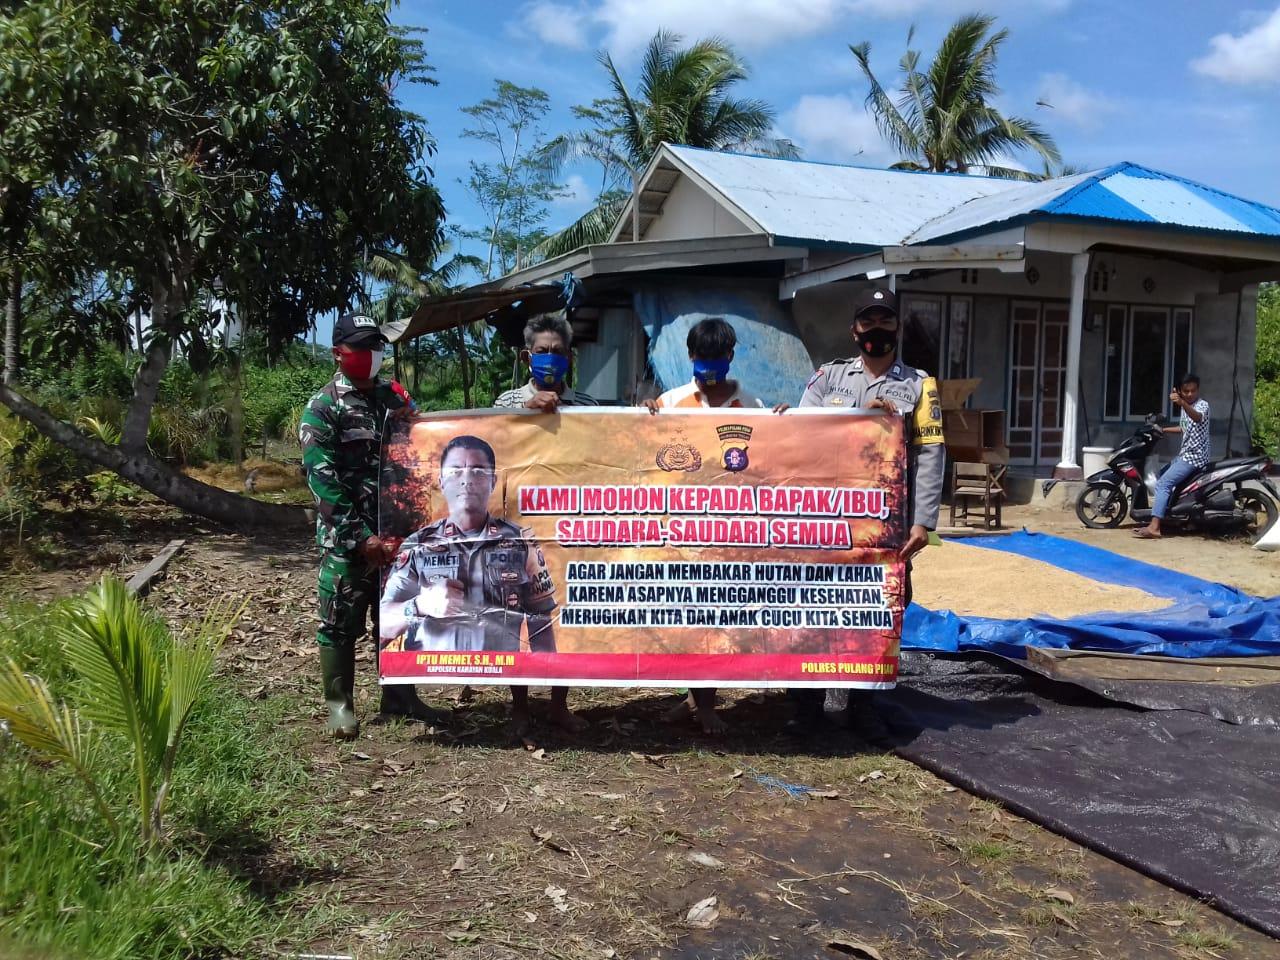 Brigadir Haikal Sampaikan Imbauan Pencegahan Karhutla ke Warga Binaan